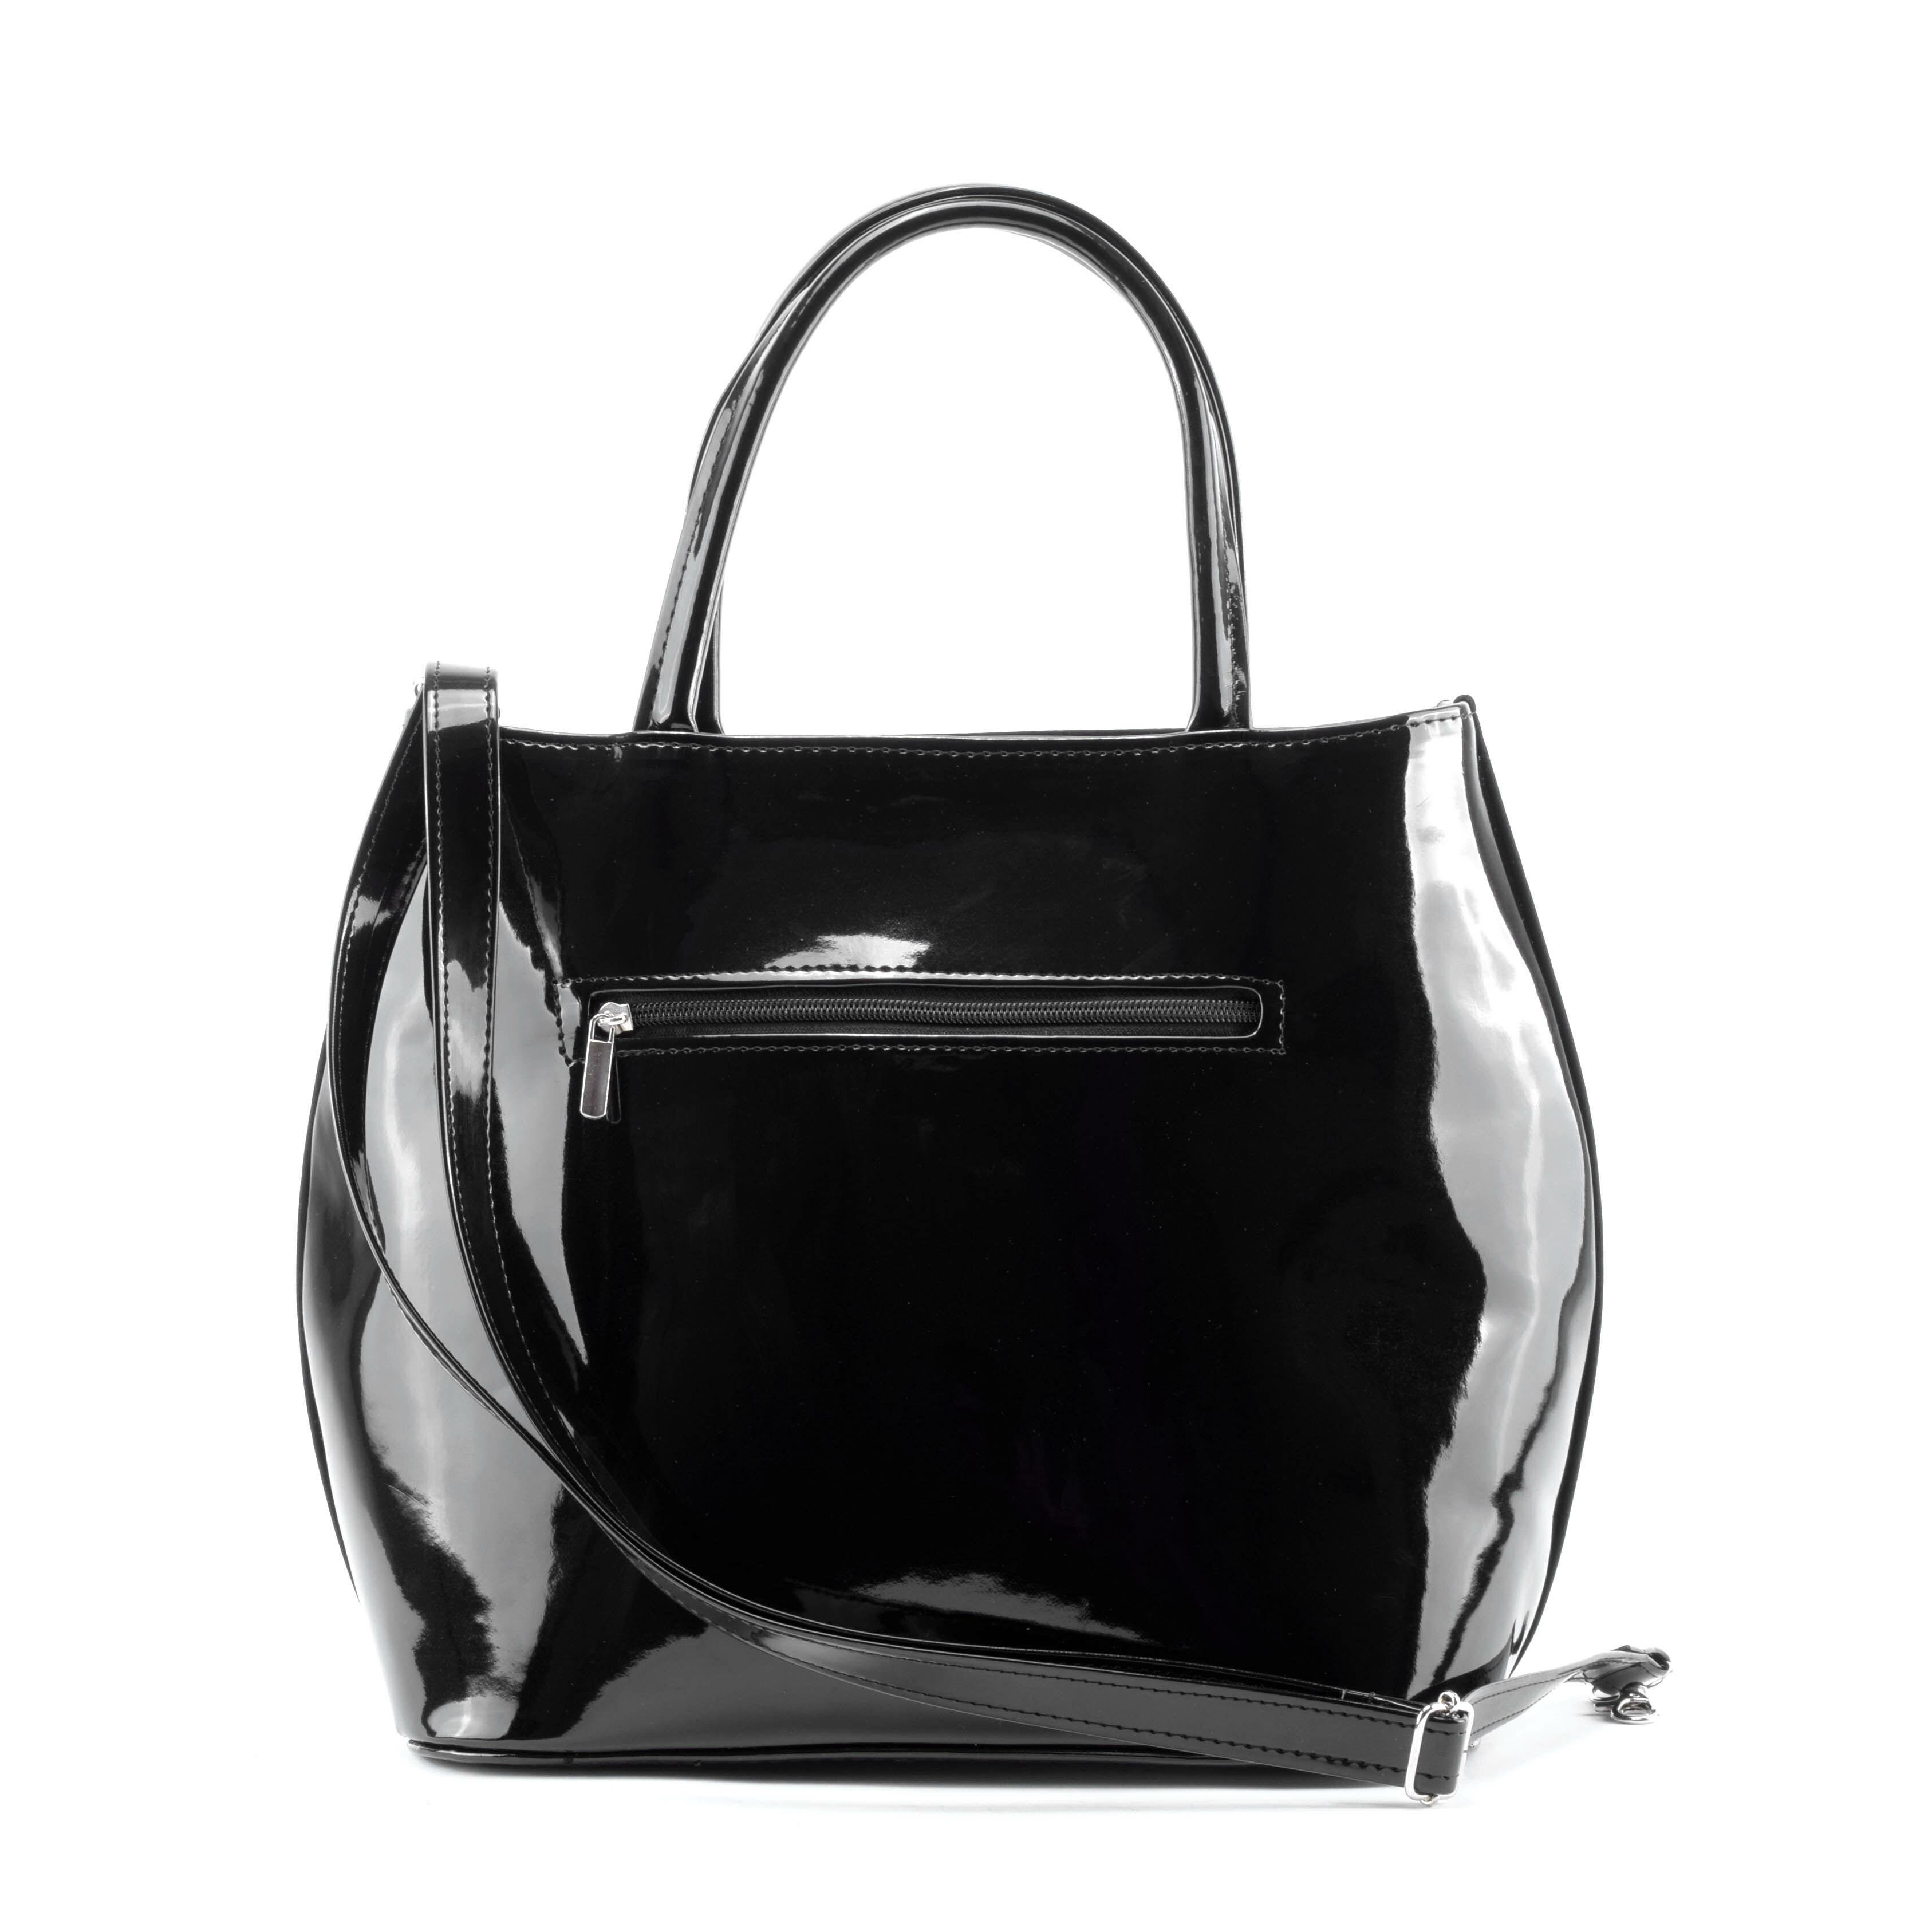 Prestige Fekete Női Művelúr Válltáska F762-BLACK - eMAG.hu 4680b070b1